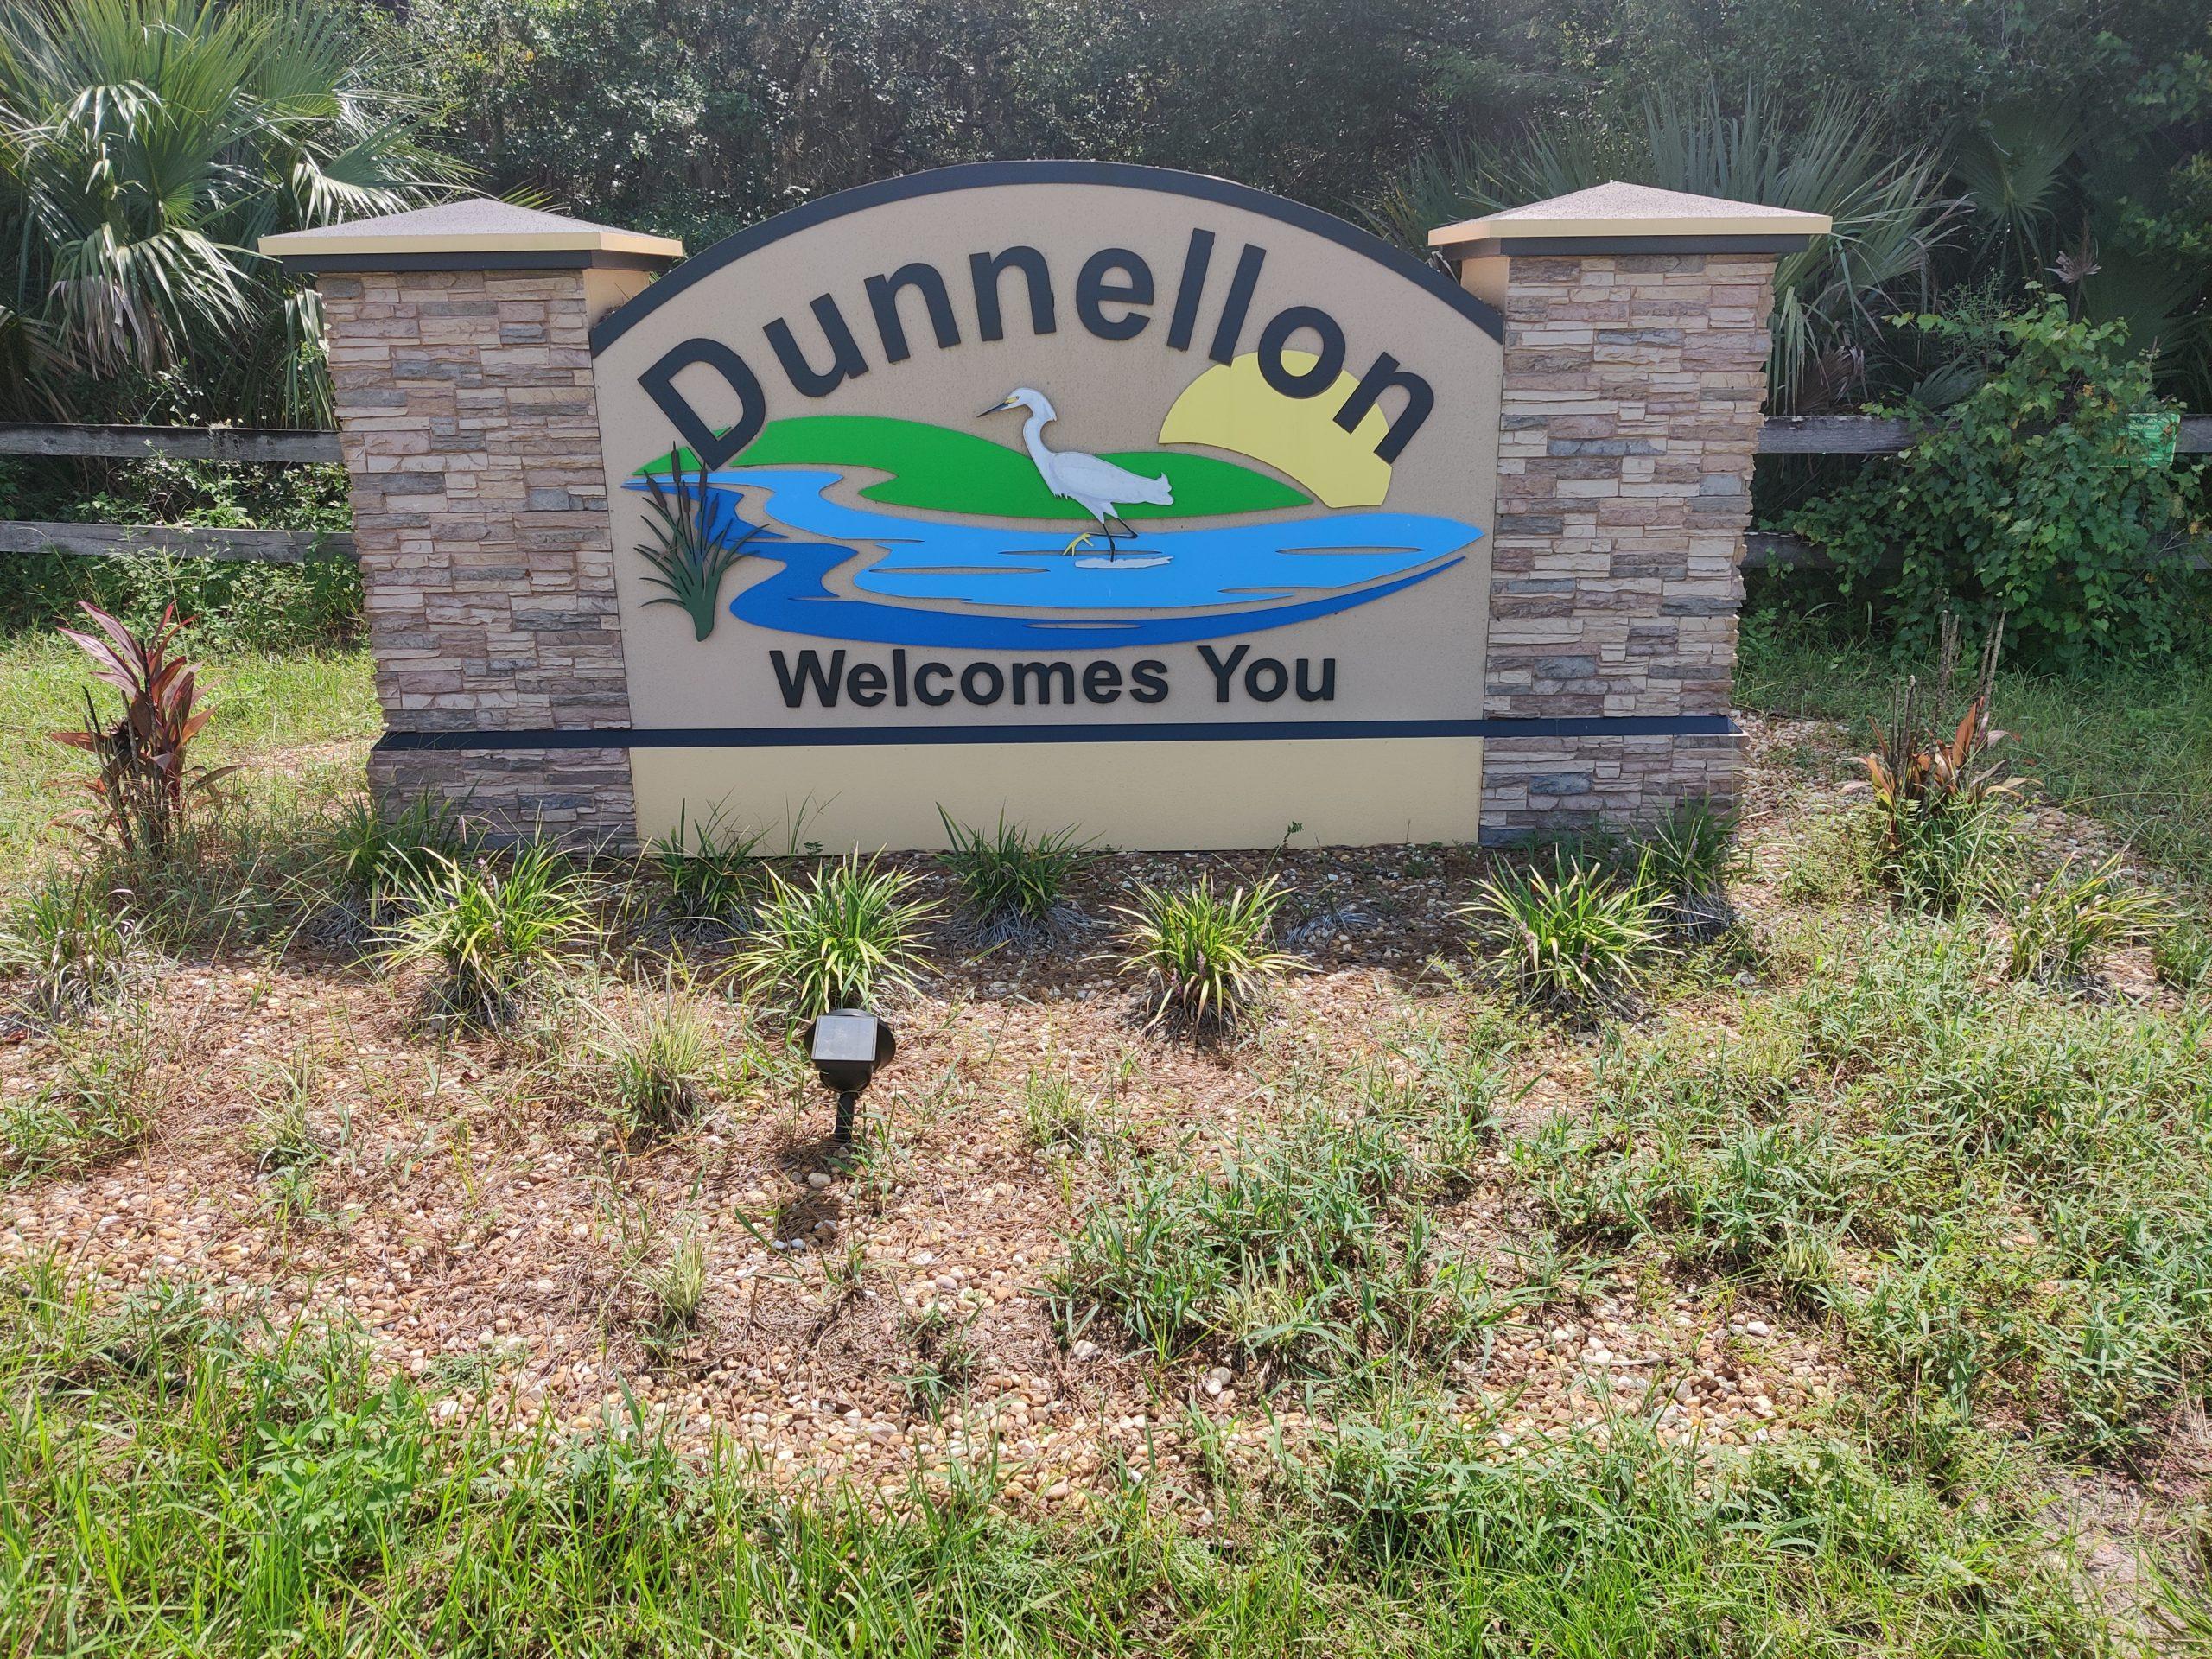 09-06-2021 Dunnellon's landscaped sign